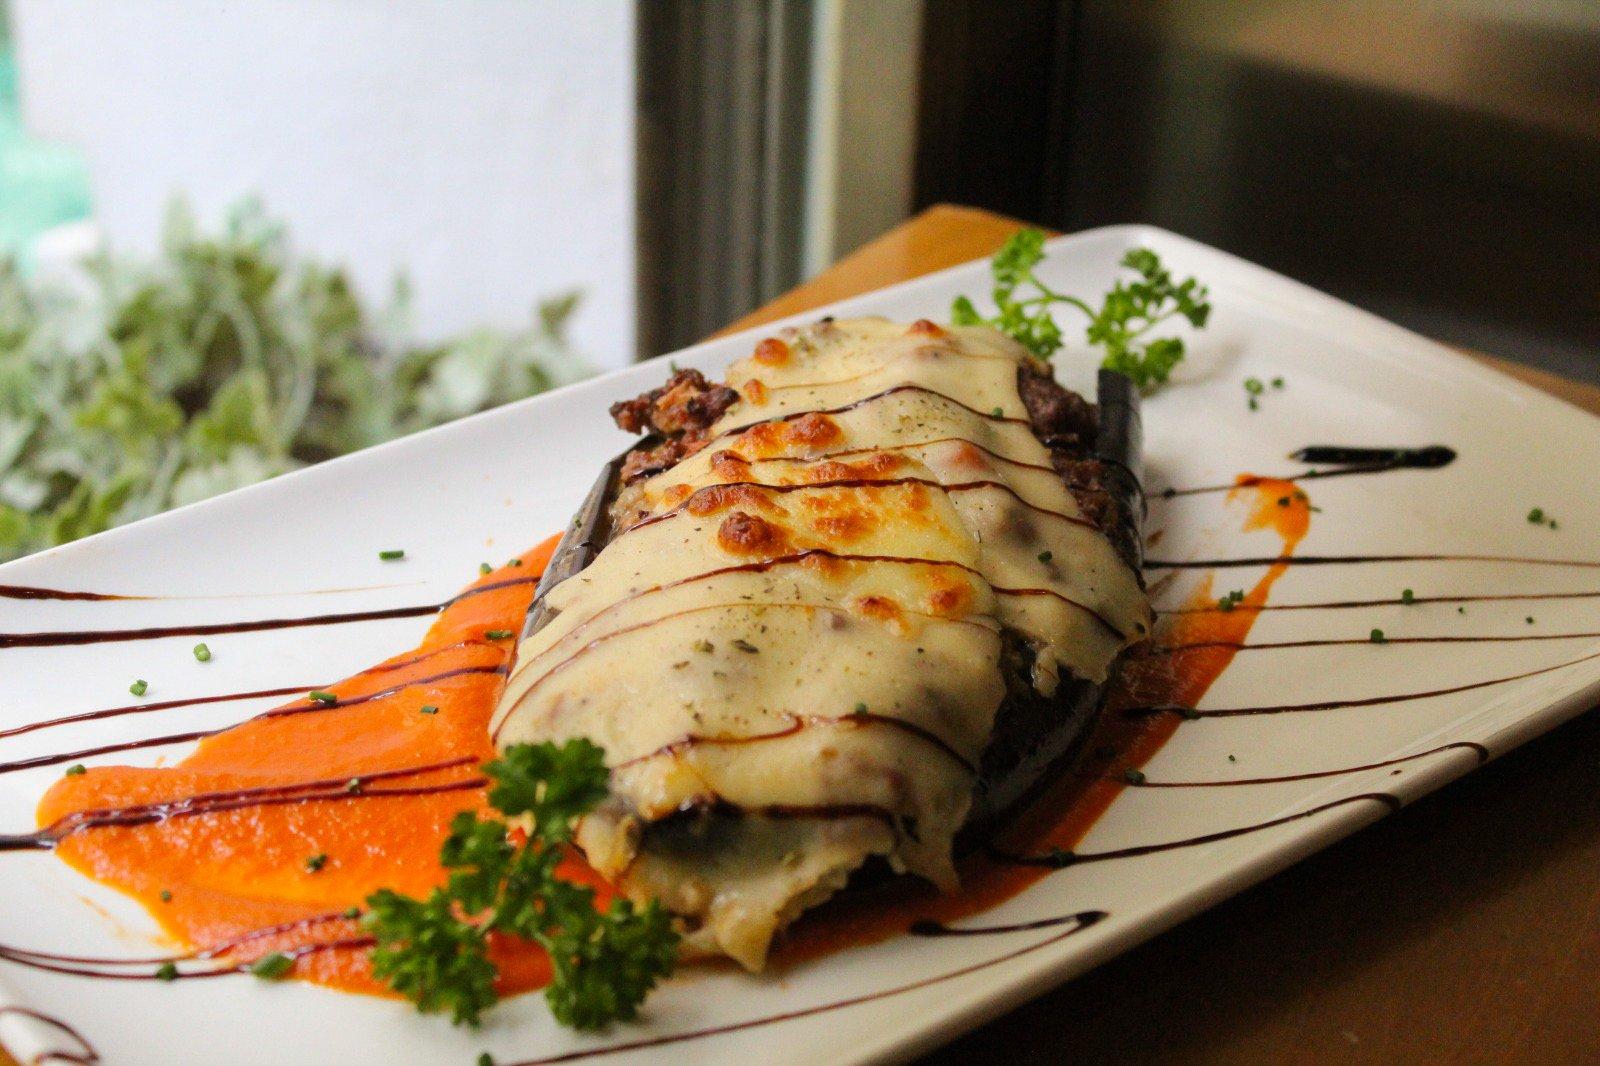 Berenjenas gratinadas rellenas de ternera con salsa de tomate casera